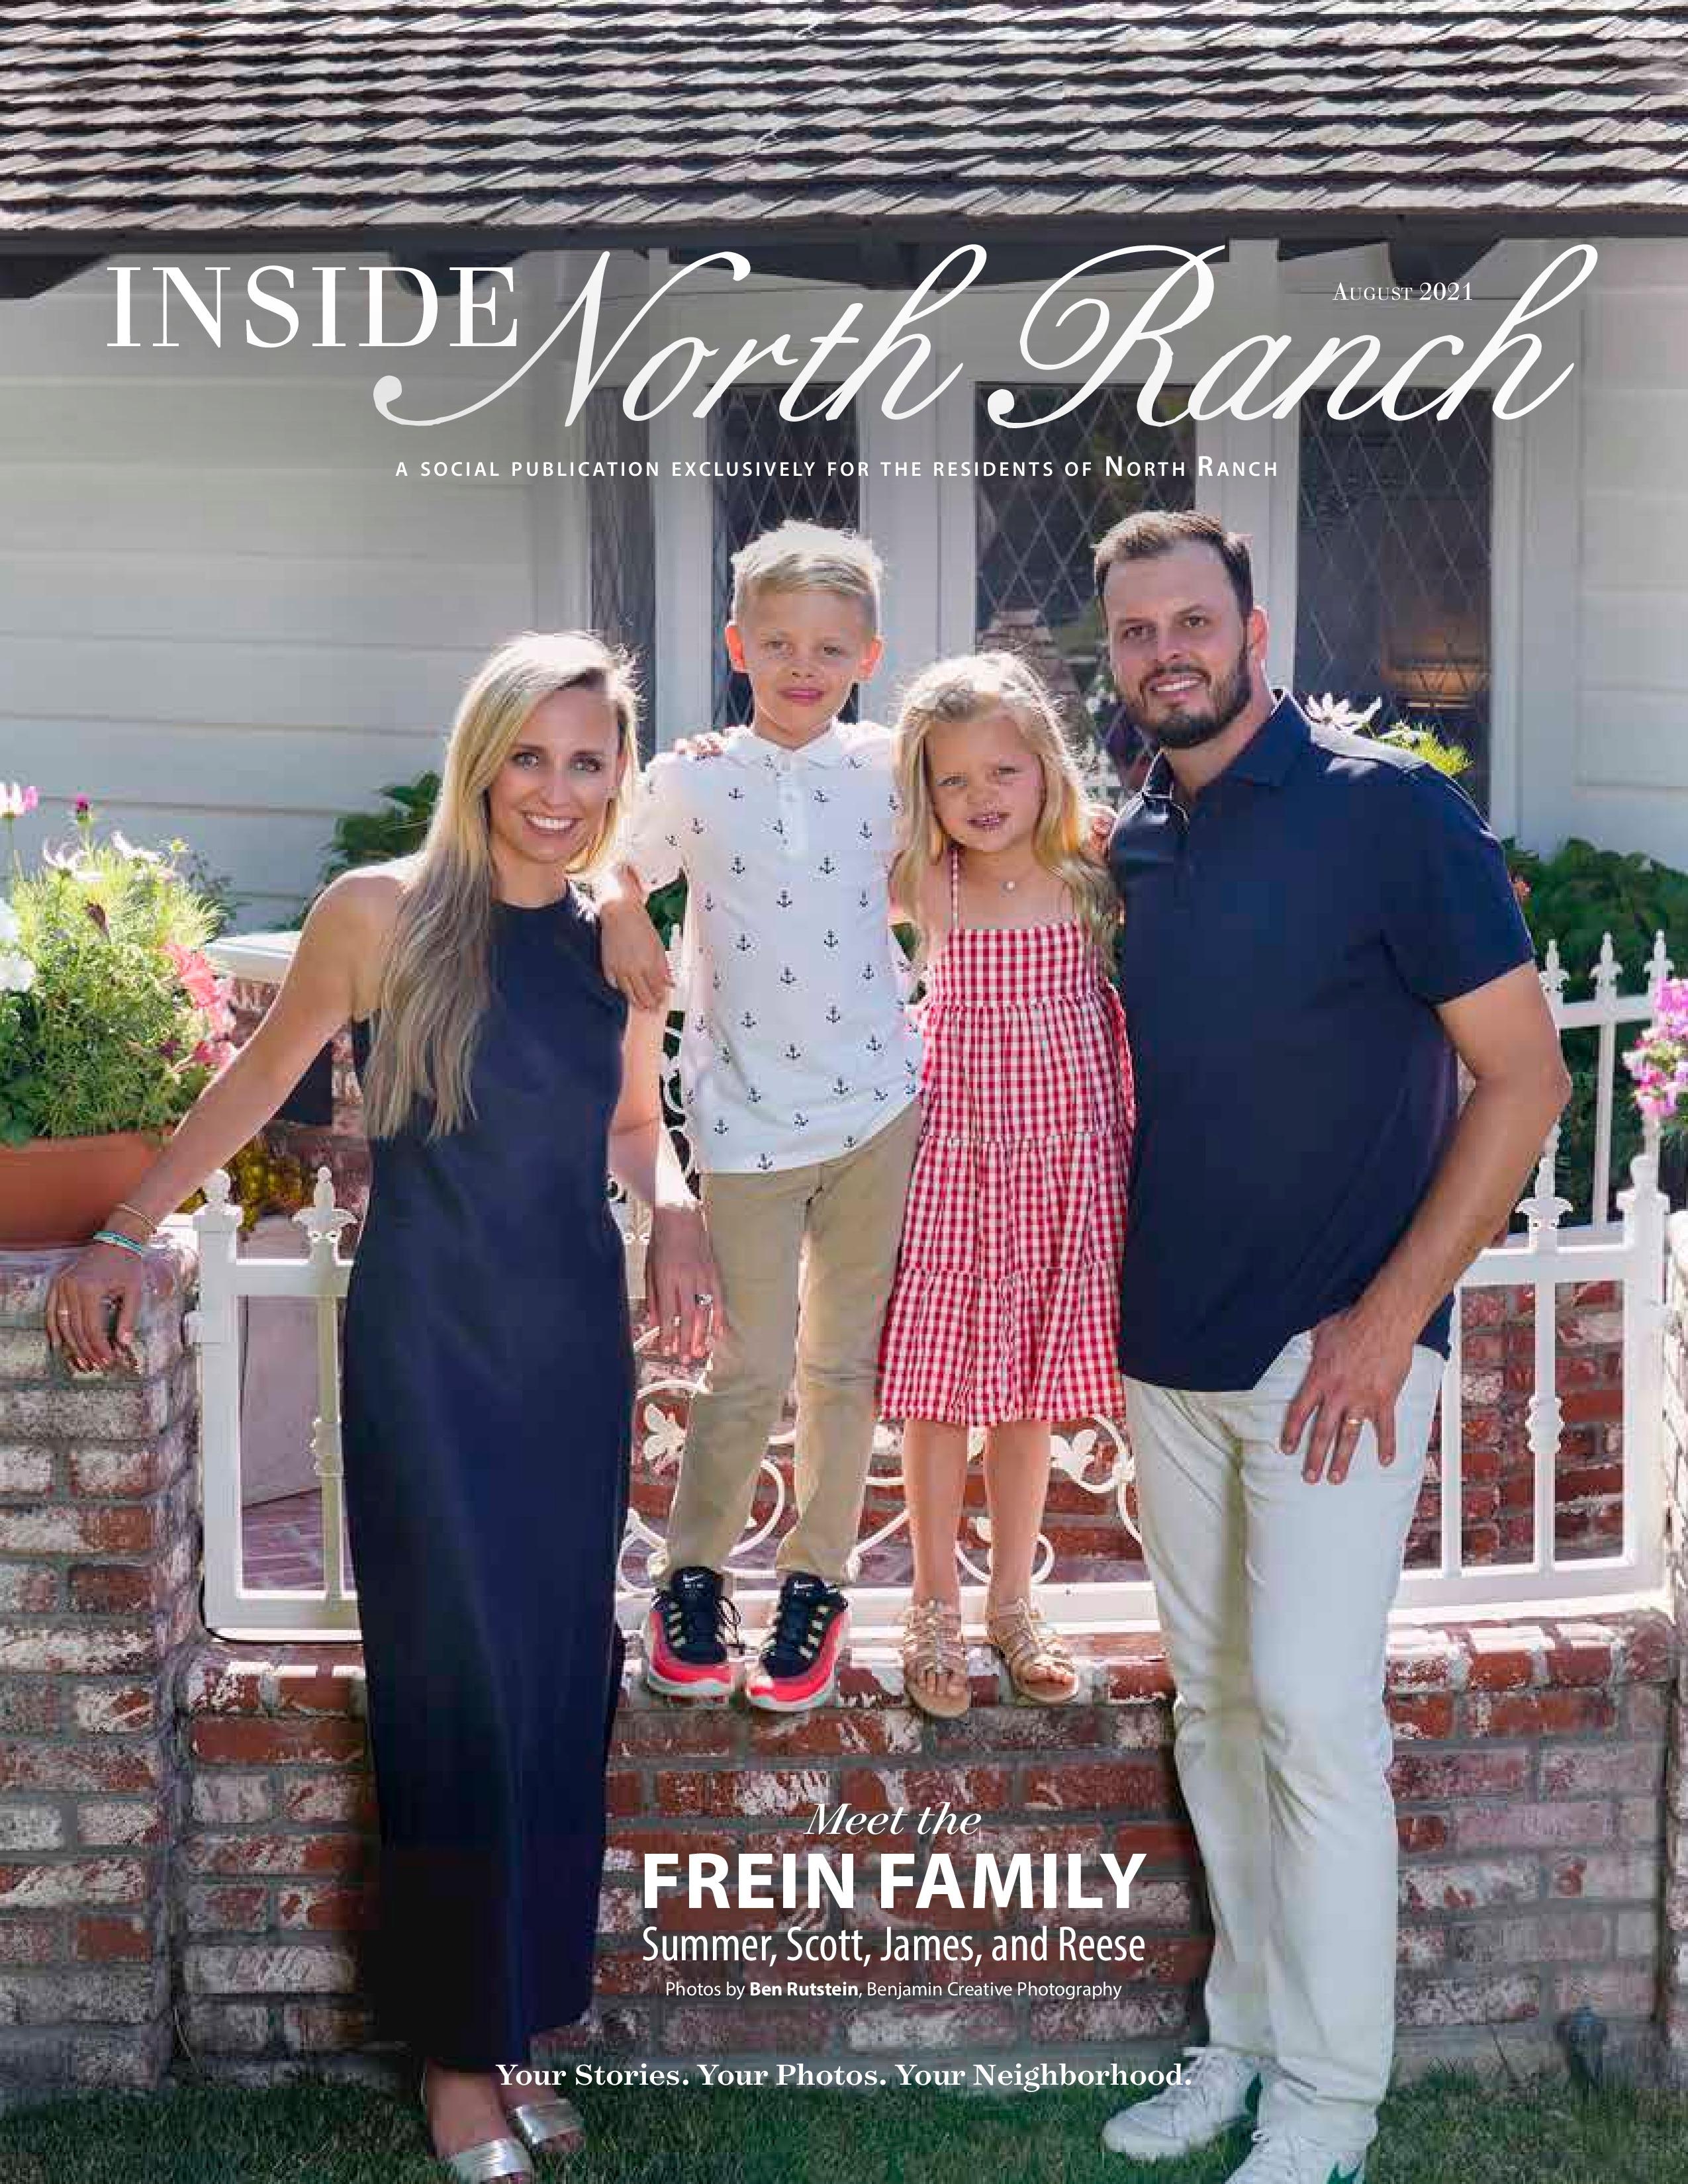 Inside North Ranch 2021-08-01